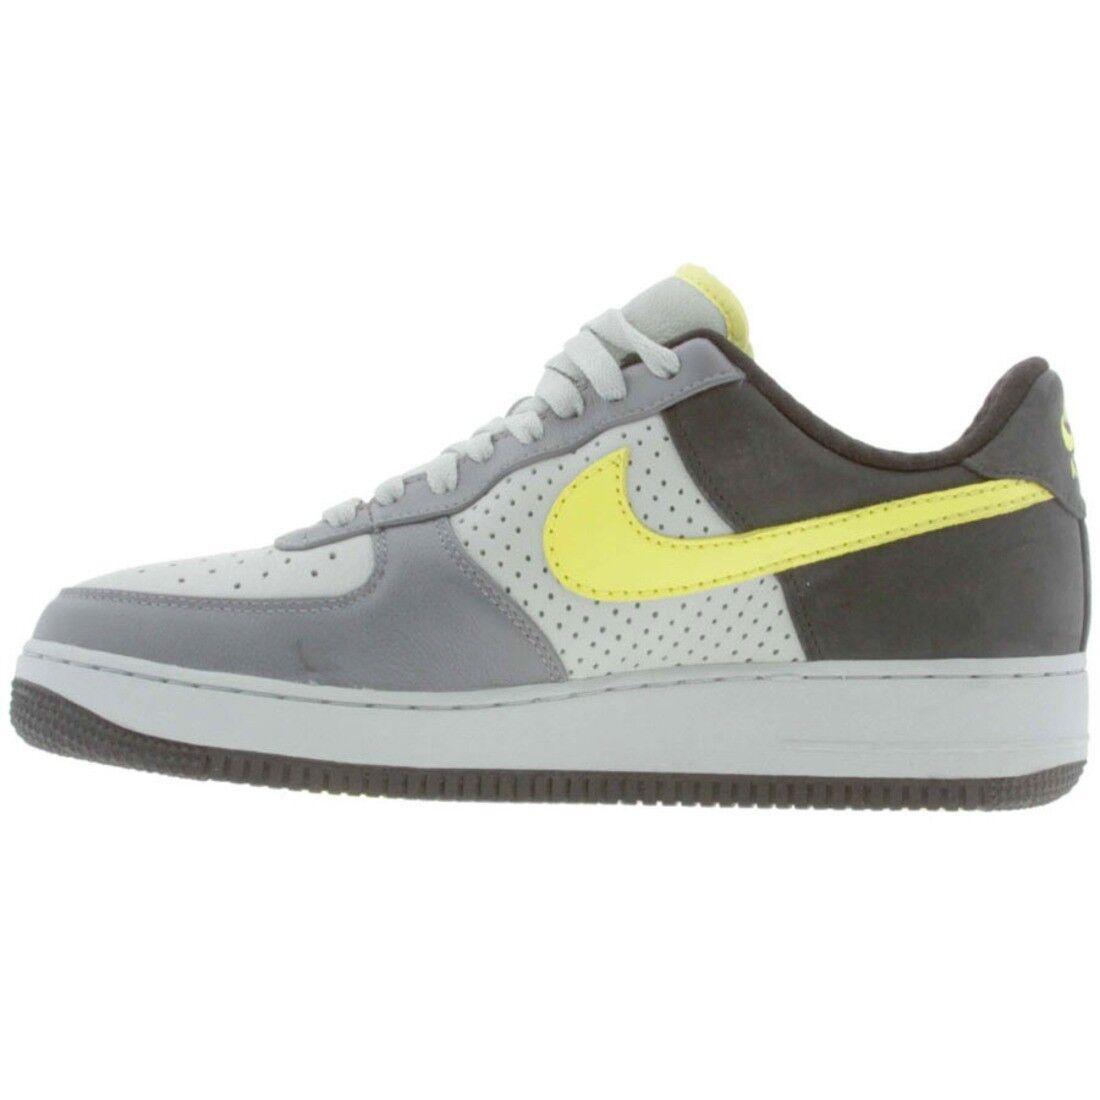 318775-071 Nike Air Force 1 07 Low PRM ACG